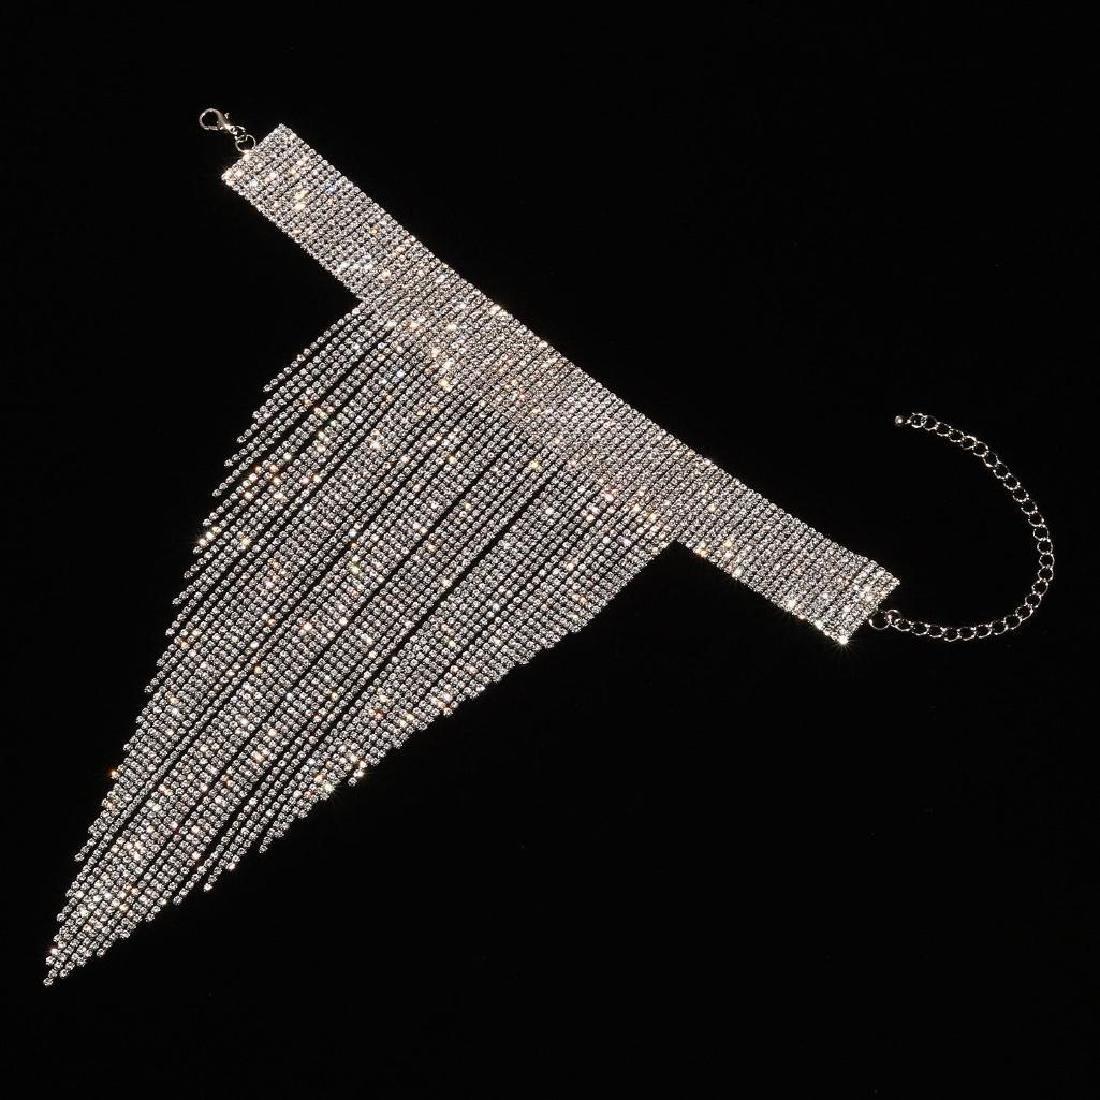 Holylove Charm Rhinestone Tassels Choker Collar Pendant - 2